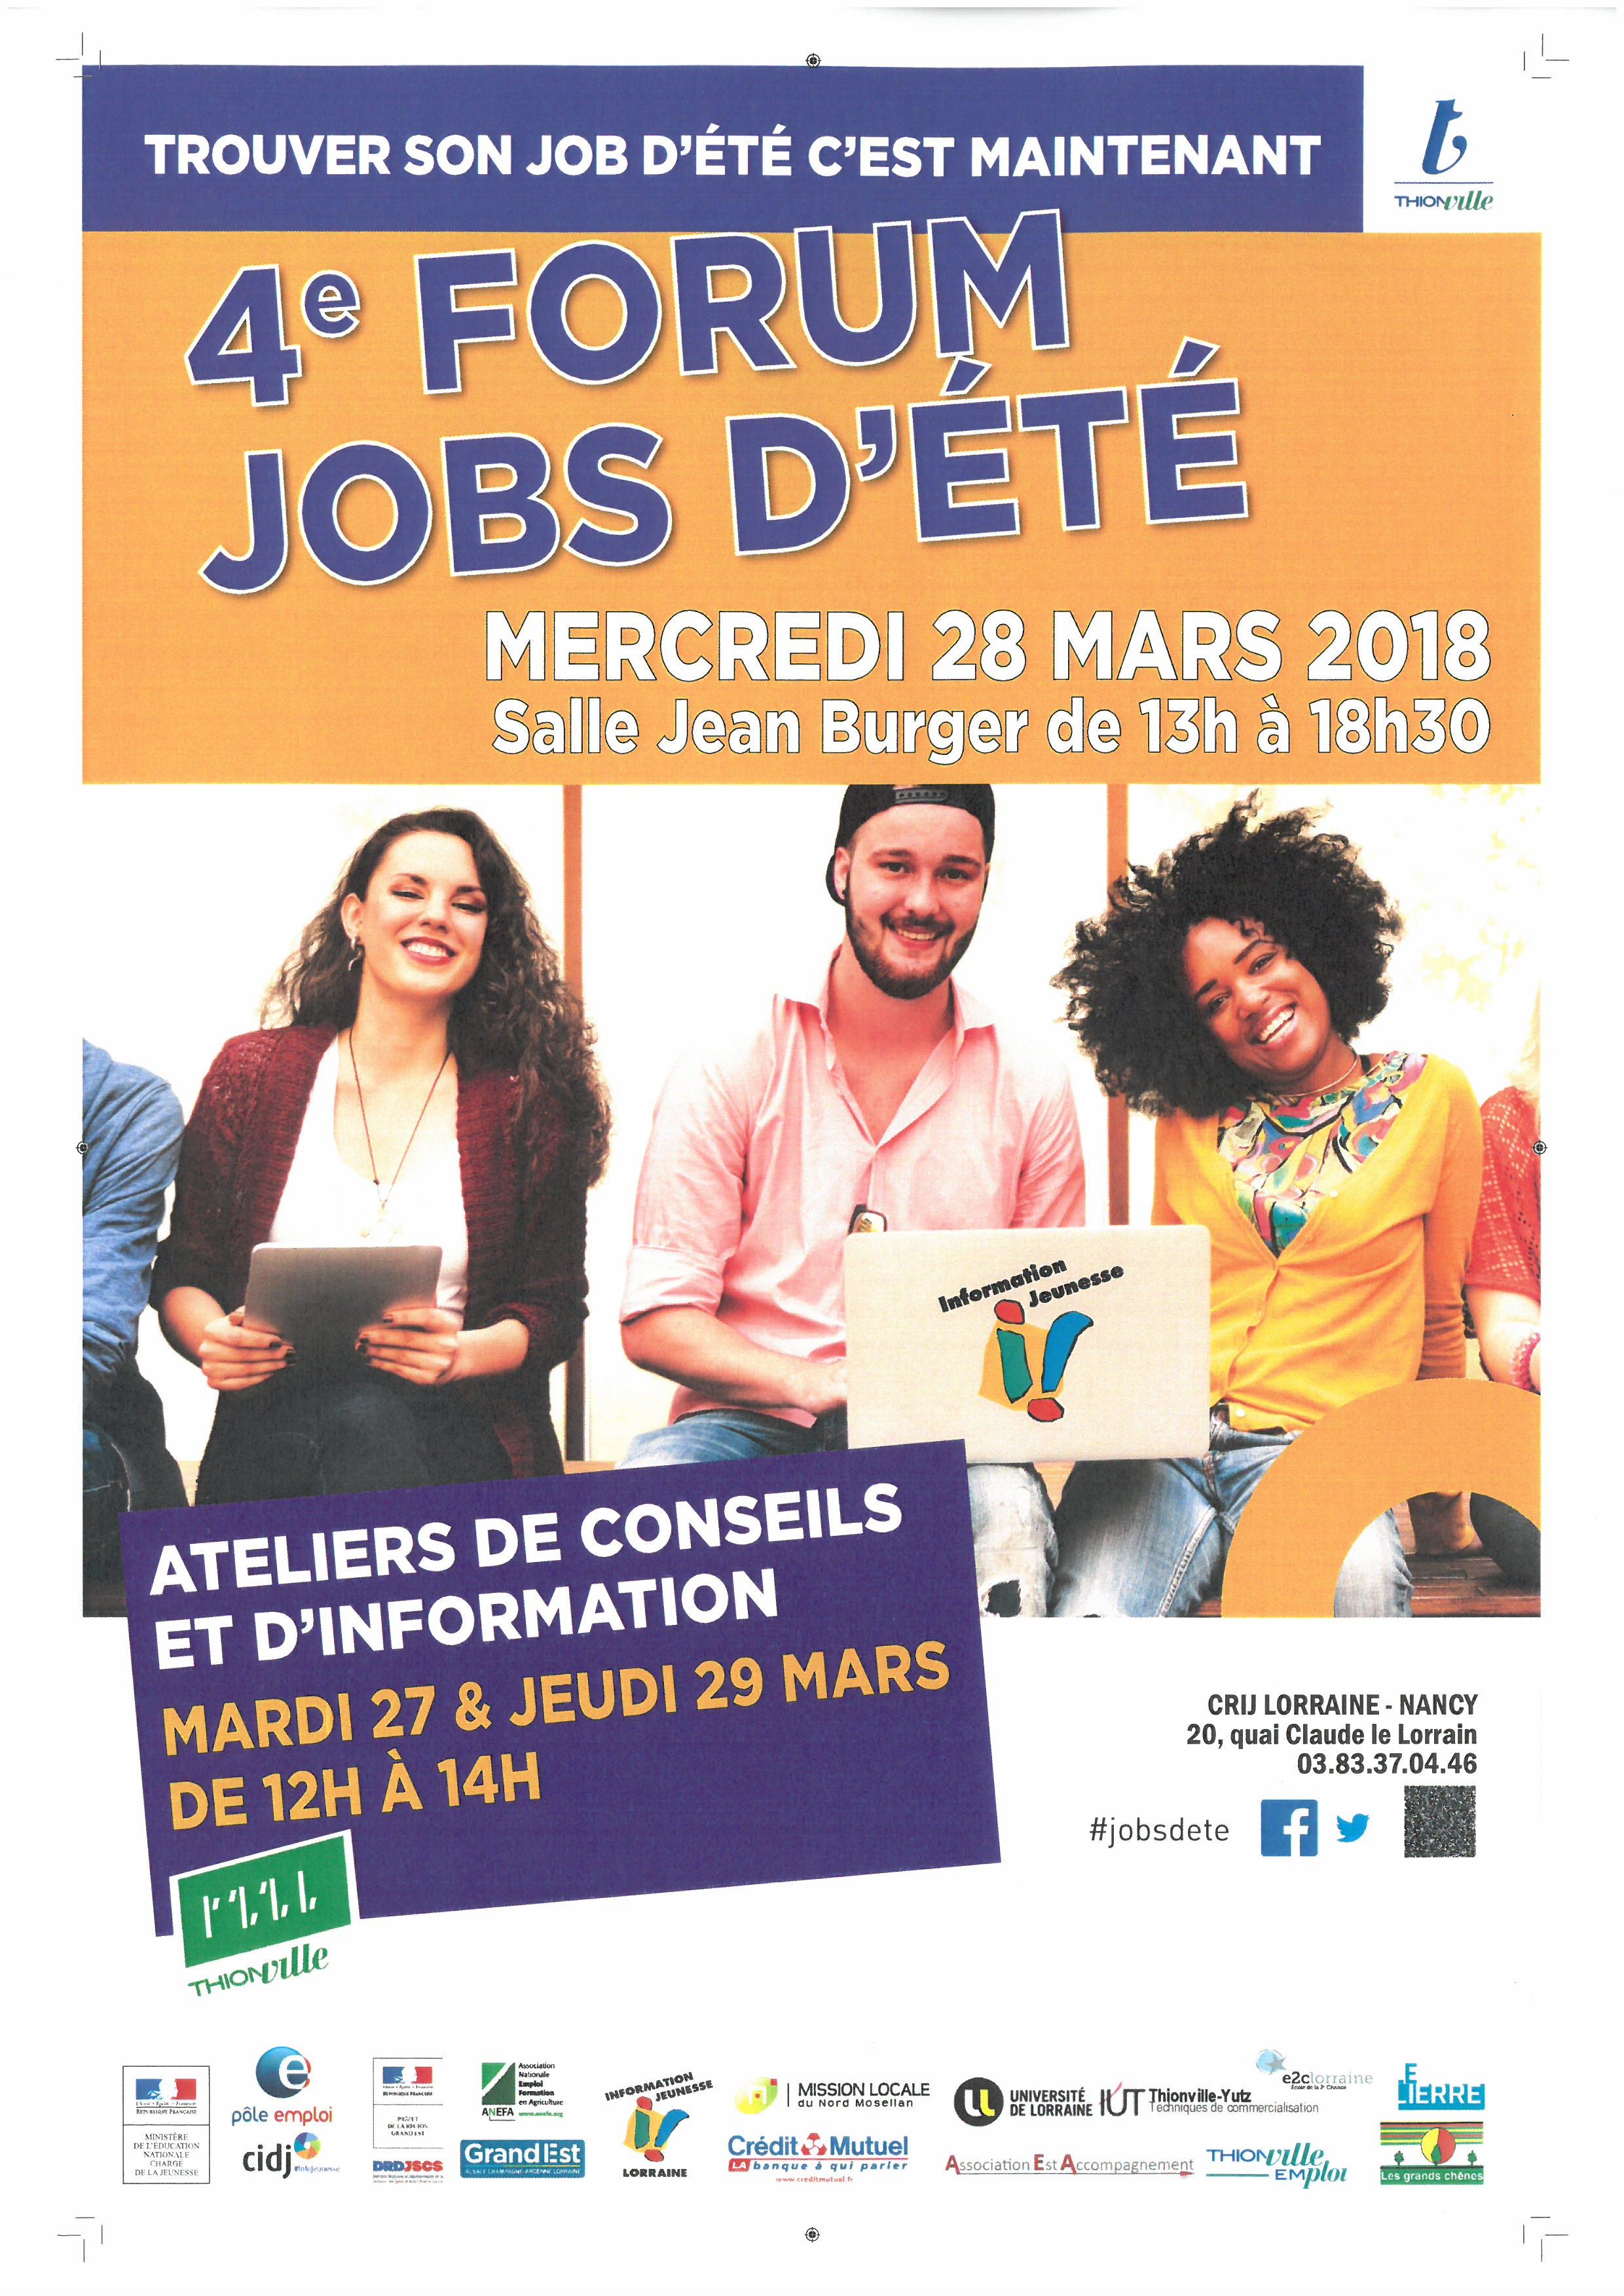 FORUM JOB D'ÉTÉ MERCREDI 28 MARS 2018  THIONVILLE